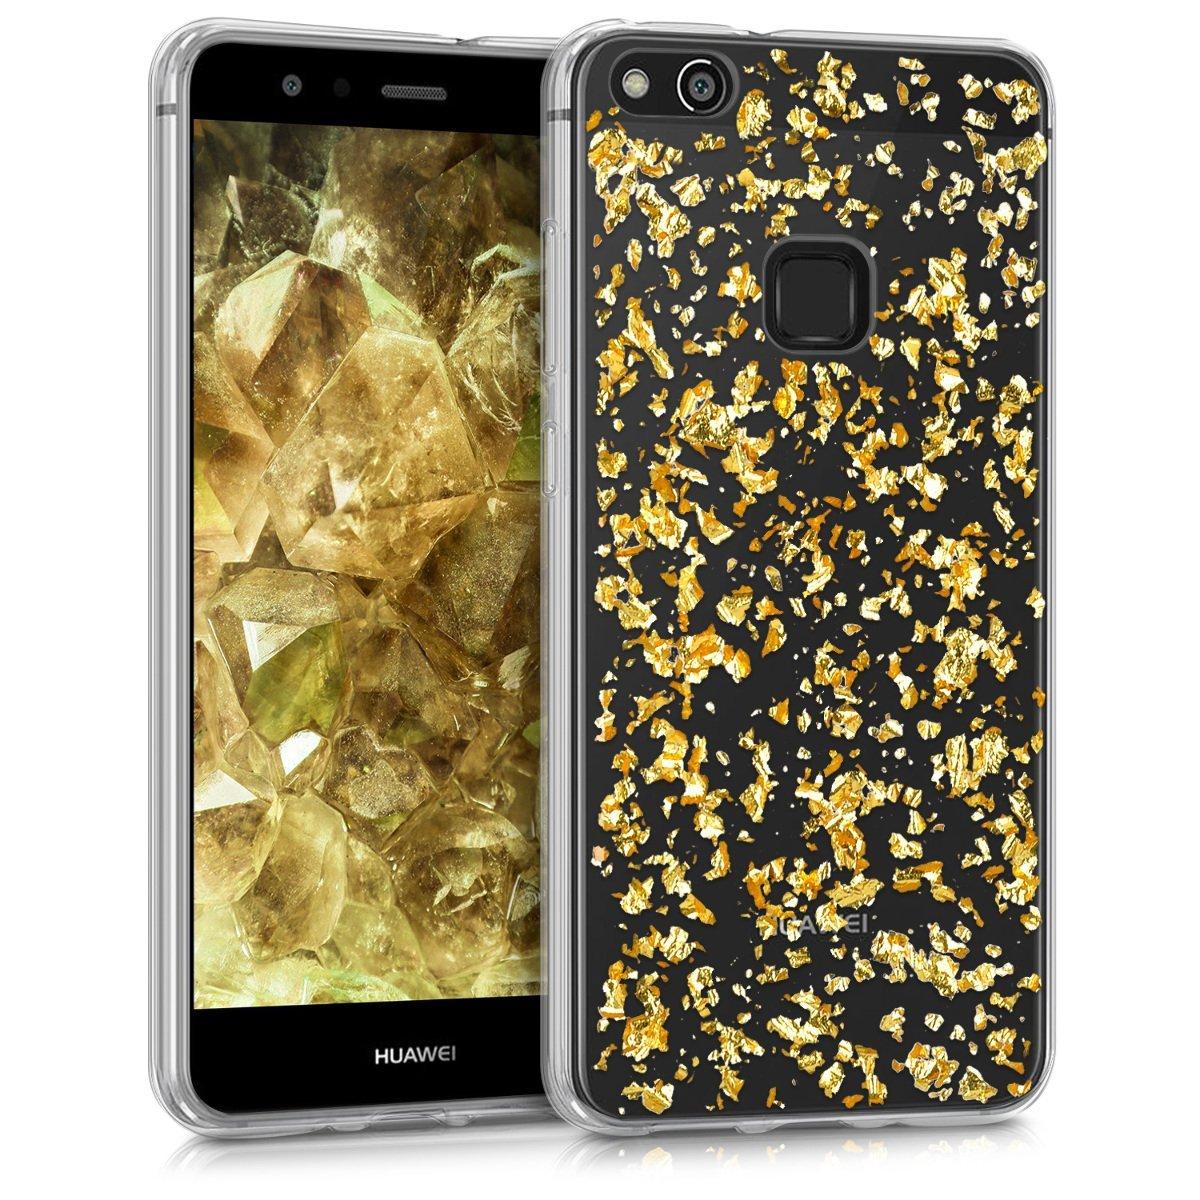 KW Θήκη Σιλικόνης Huawei P10 Lite (41378.01)